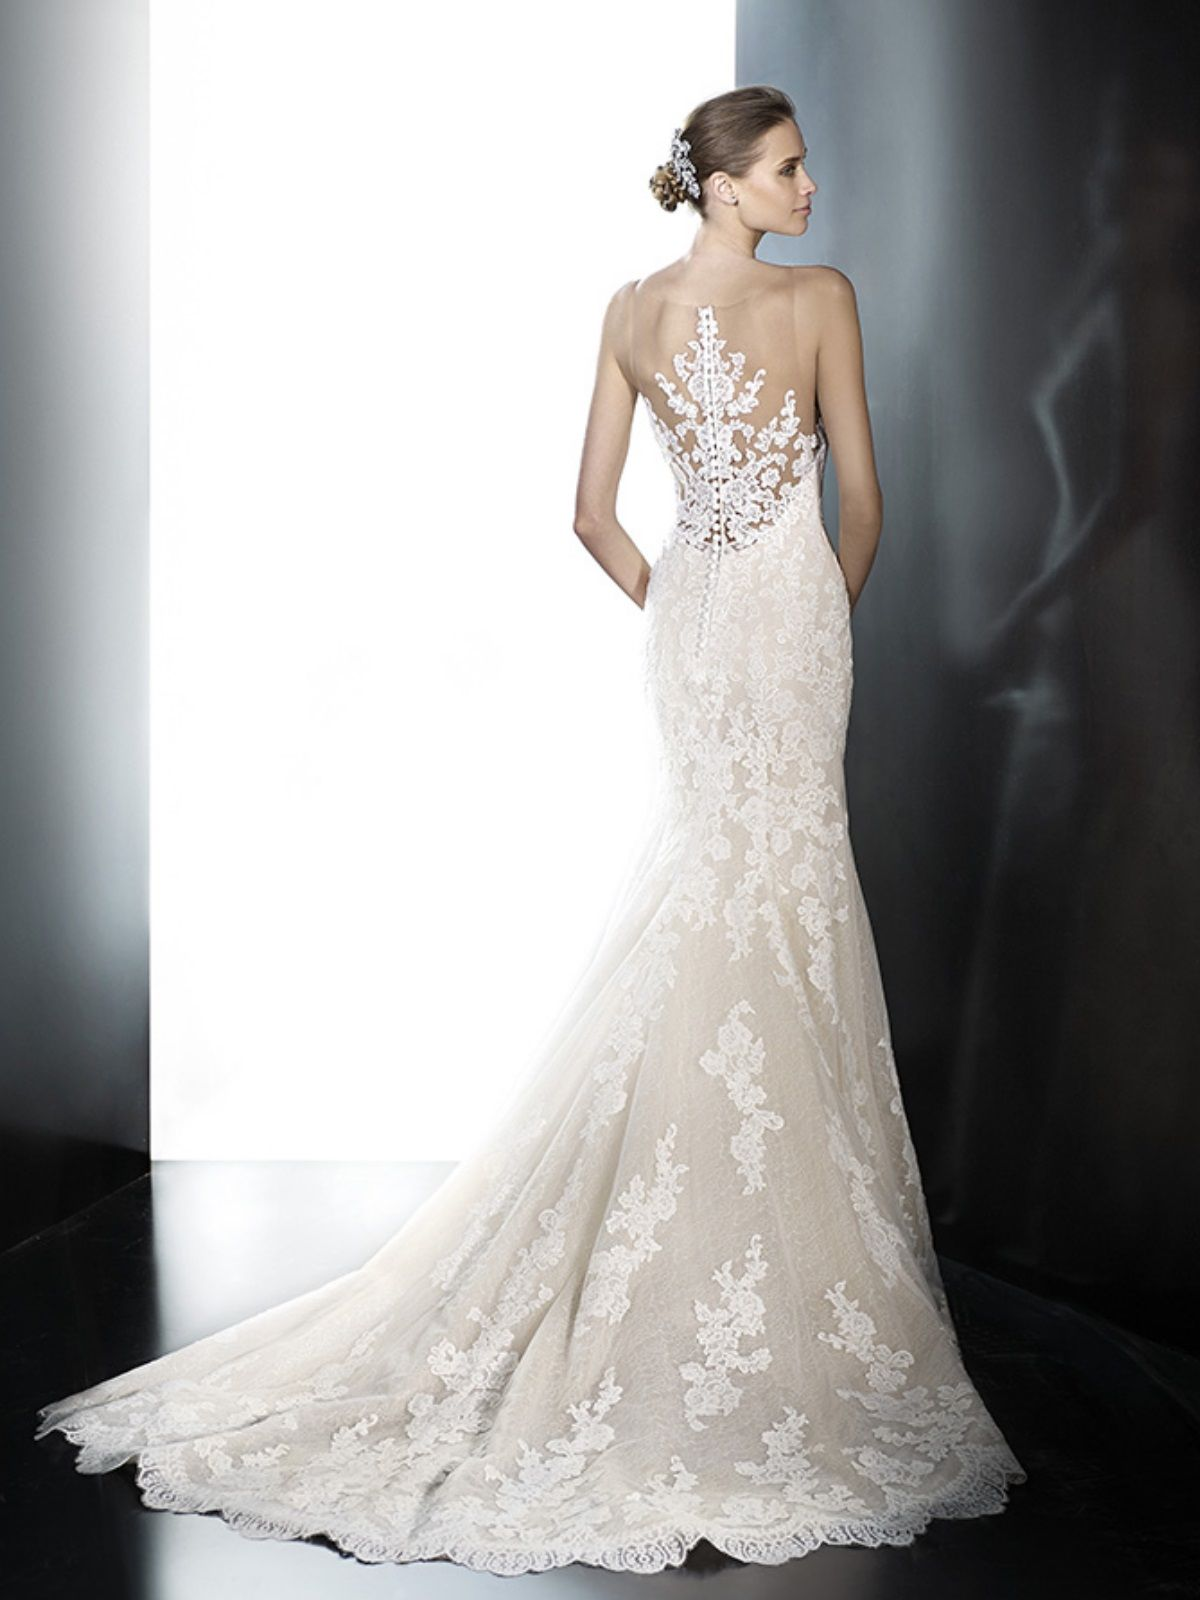 Trourok deur Pronovias - Placia - just bought this dress on the ...